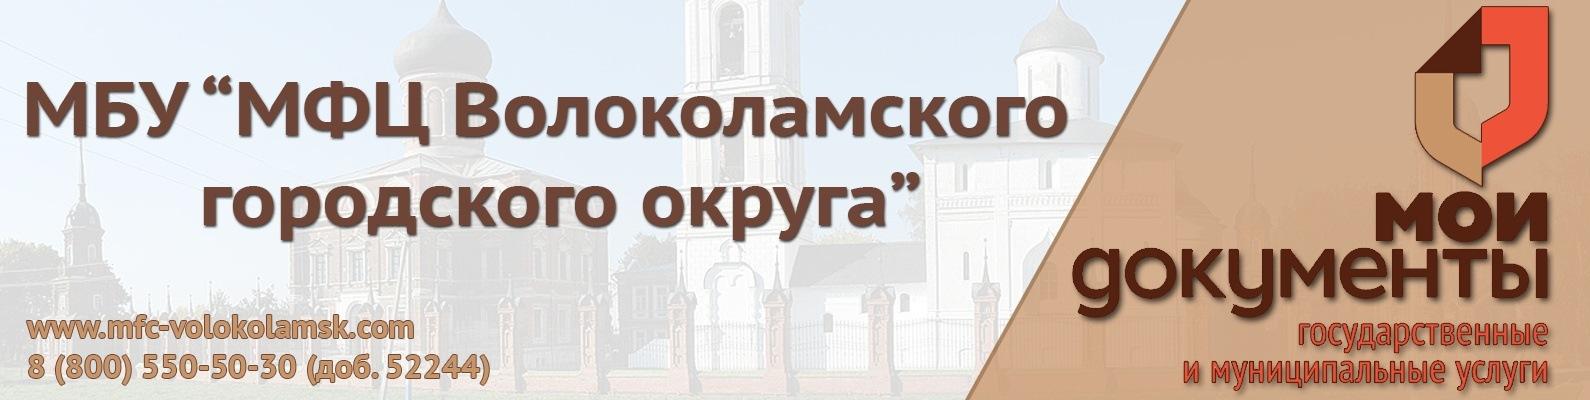 Мфц загранпаспорт нового образца москва документы